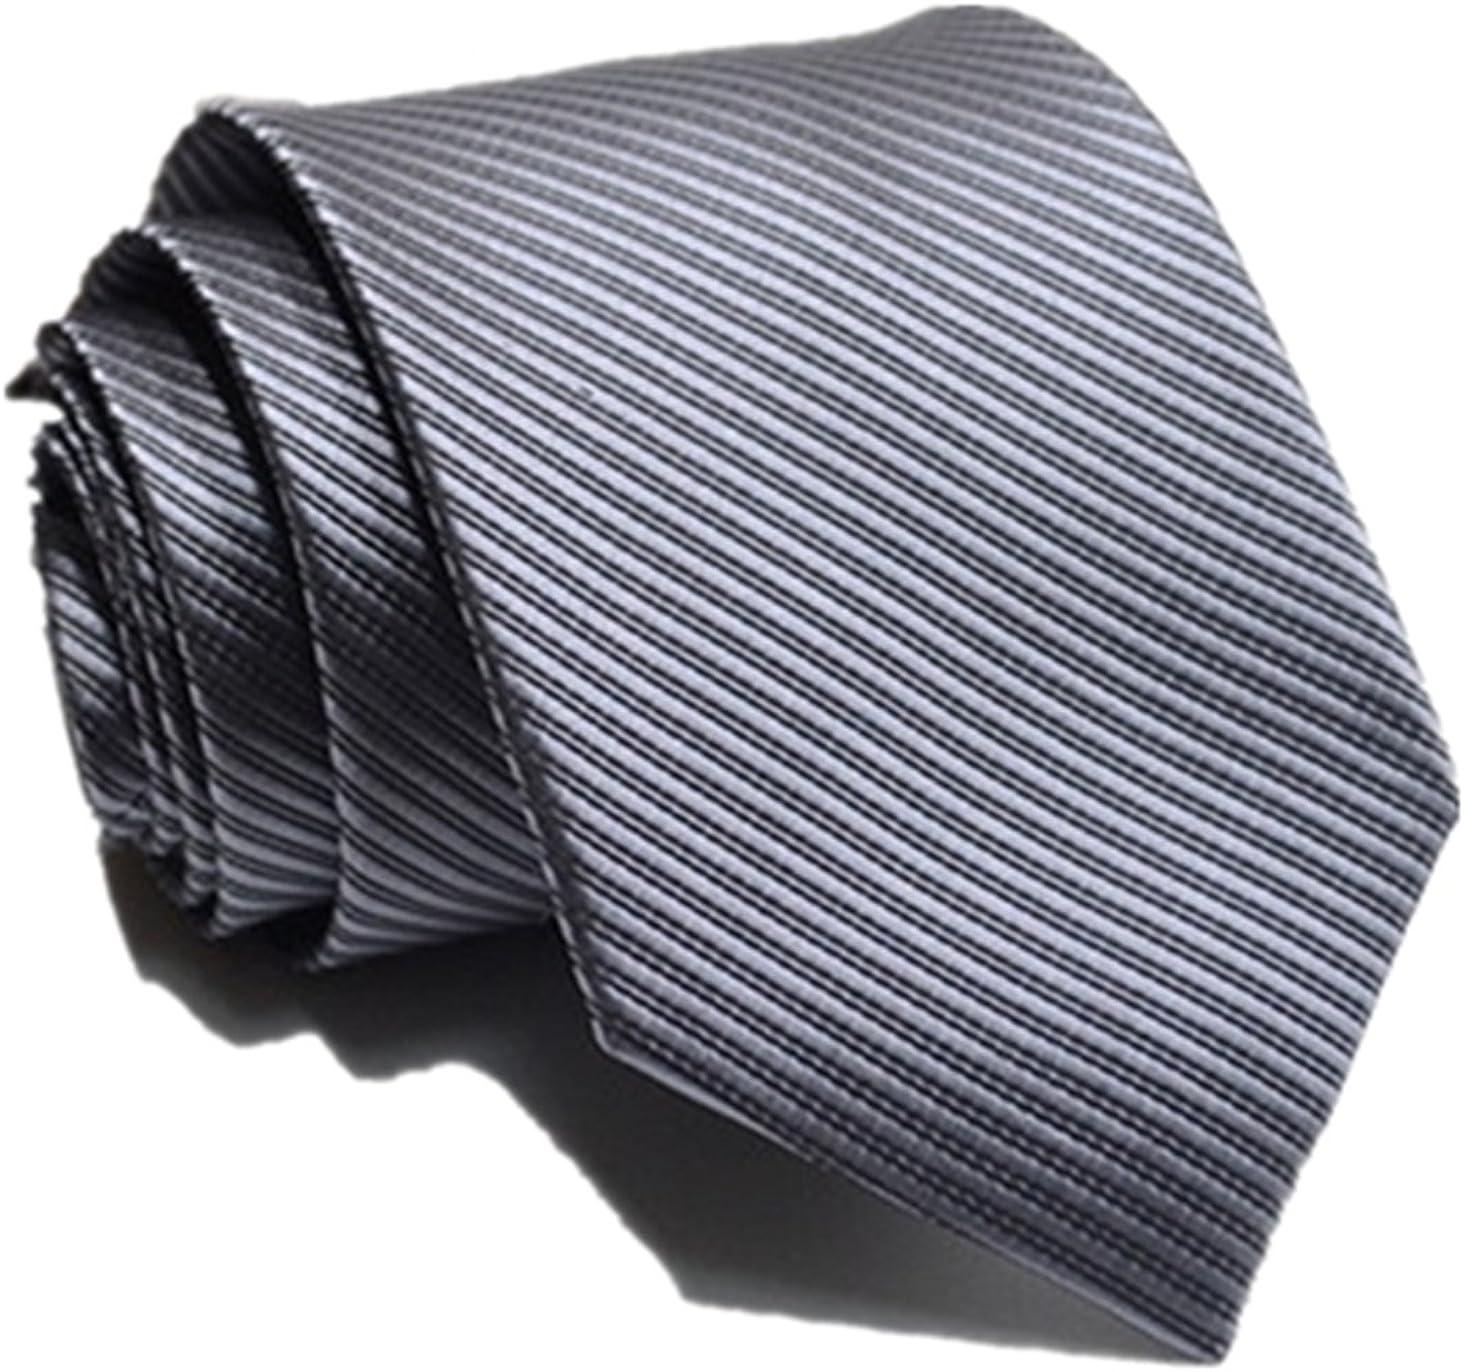 XGSD Mens Suits 3 Piece Jacket//Pants//Vest Formal Slim Fit Fashion Business Suits Groom Suits for Wedding